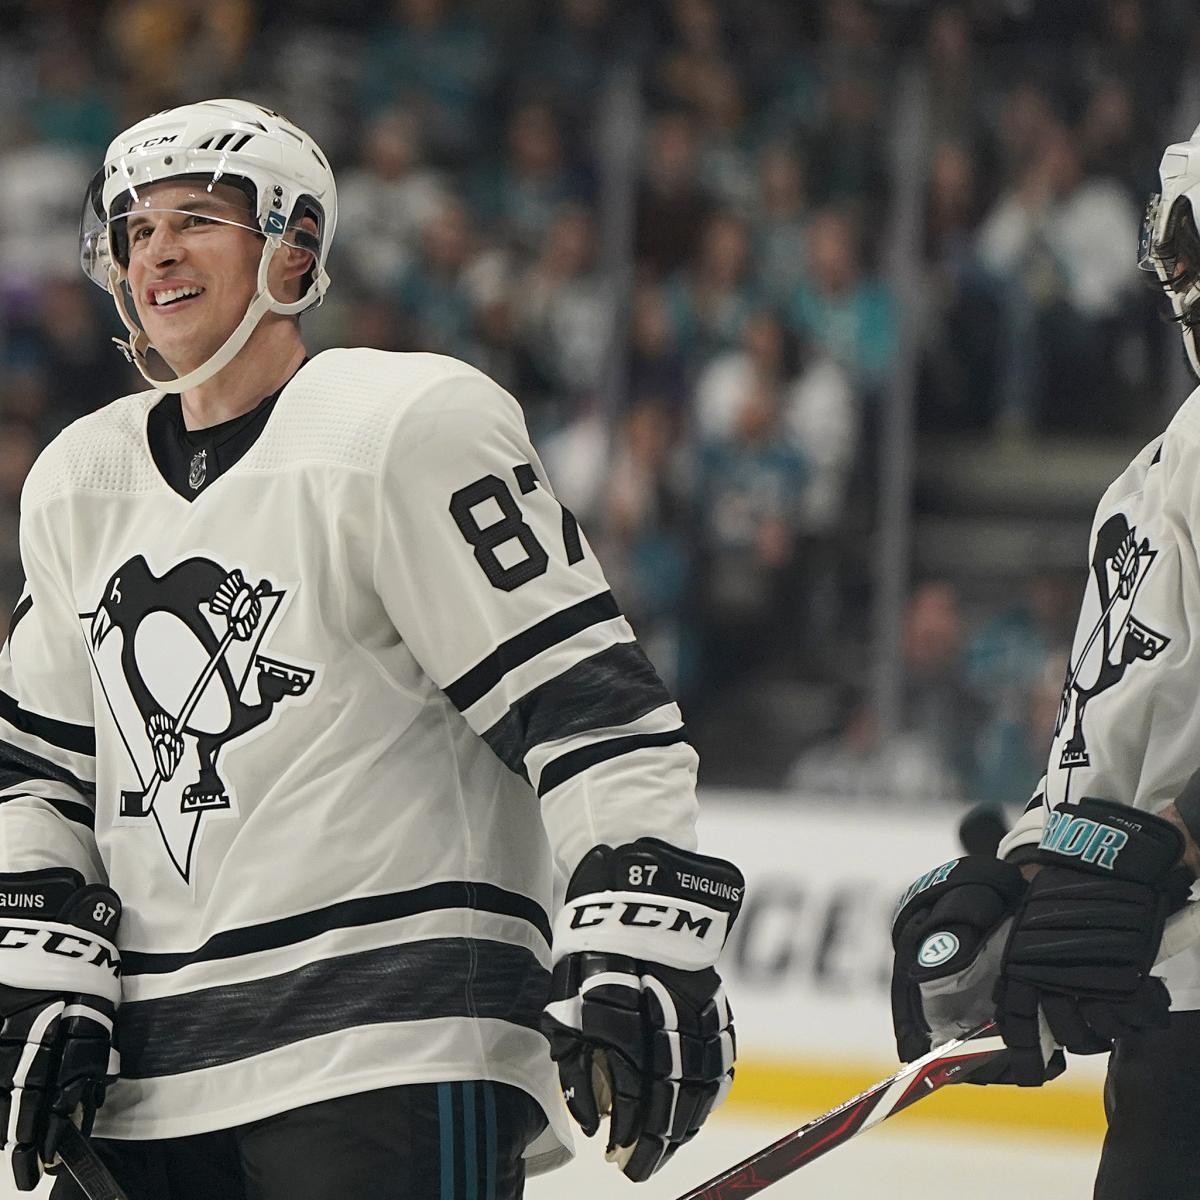 995ae7f76 Sidney Crosby Wins MVP as Metropolitan Team Wins 2019 NHL All-Star Game